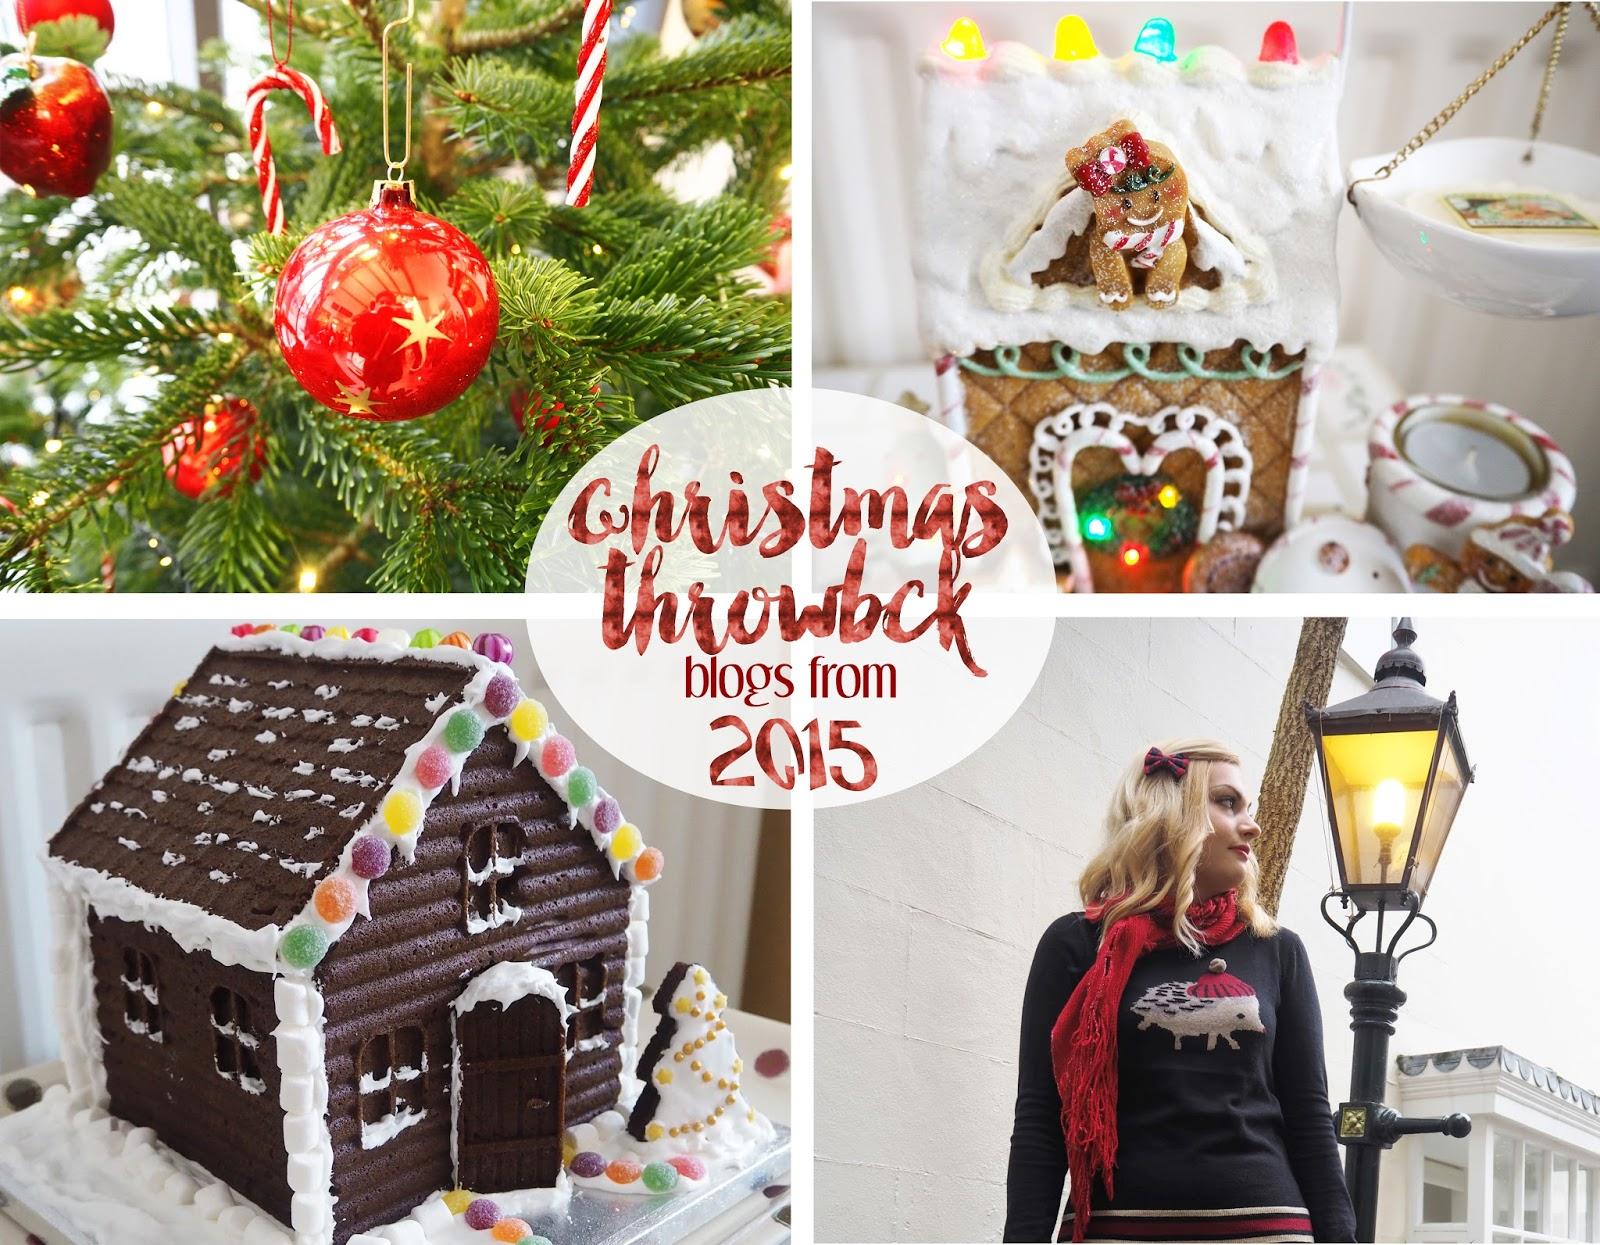 Christmas Throwback: Blogs From 2015, Katie Kirk Loves, UK Blogger, UK Fashion Blogger, UK Beauty Blogger, UK Lifestyle Blogger, UK Food Blogger, West Sussex Bloggers, Brighton Blogger